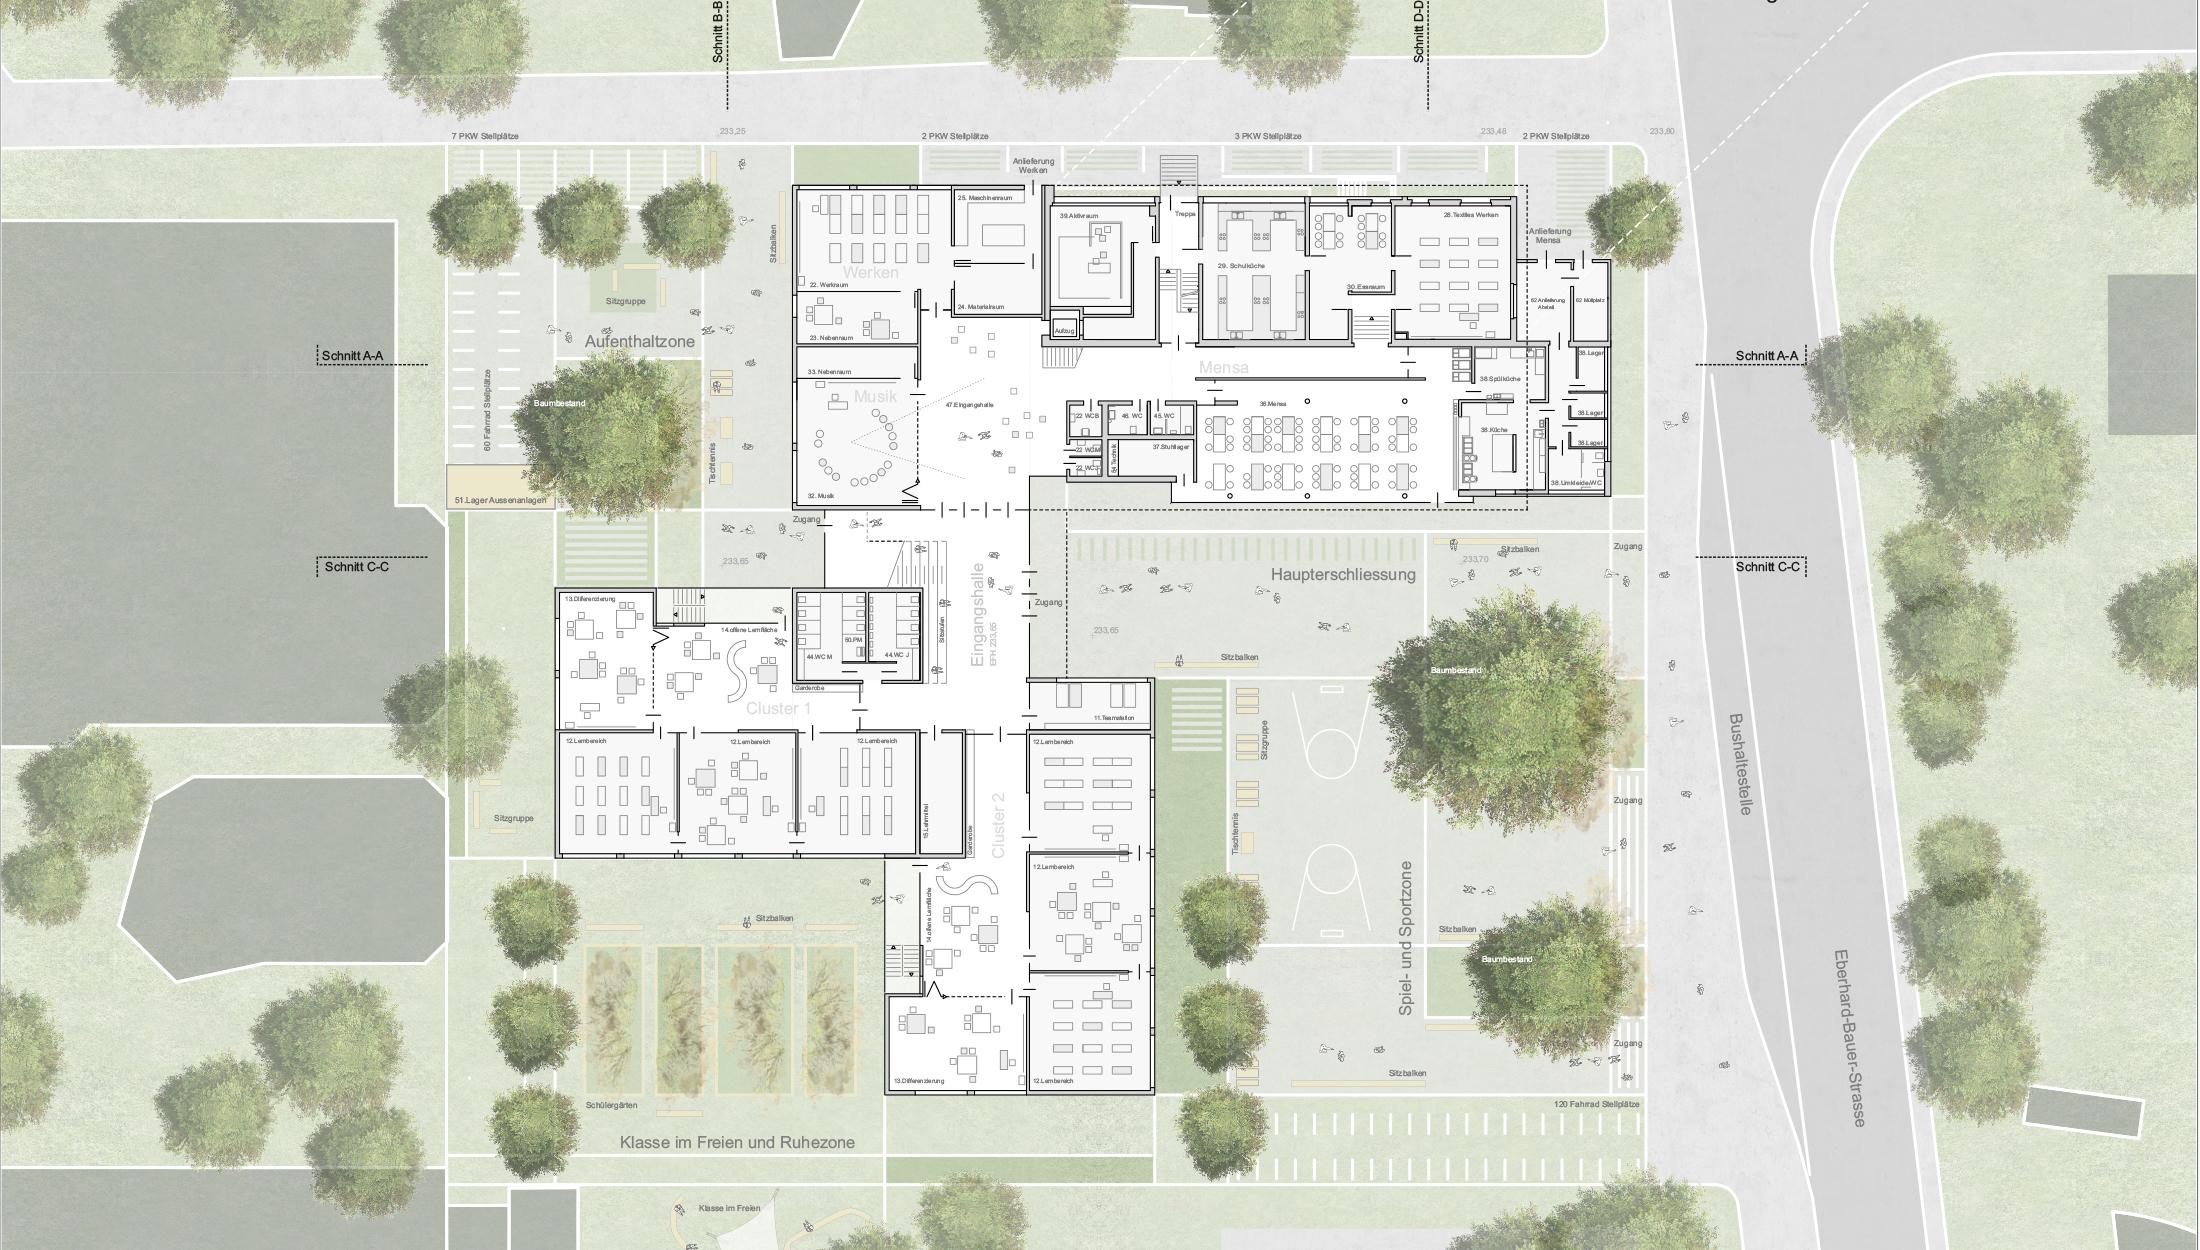 2021, Verfahrensbetreuung Neue Schule, Esslingen